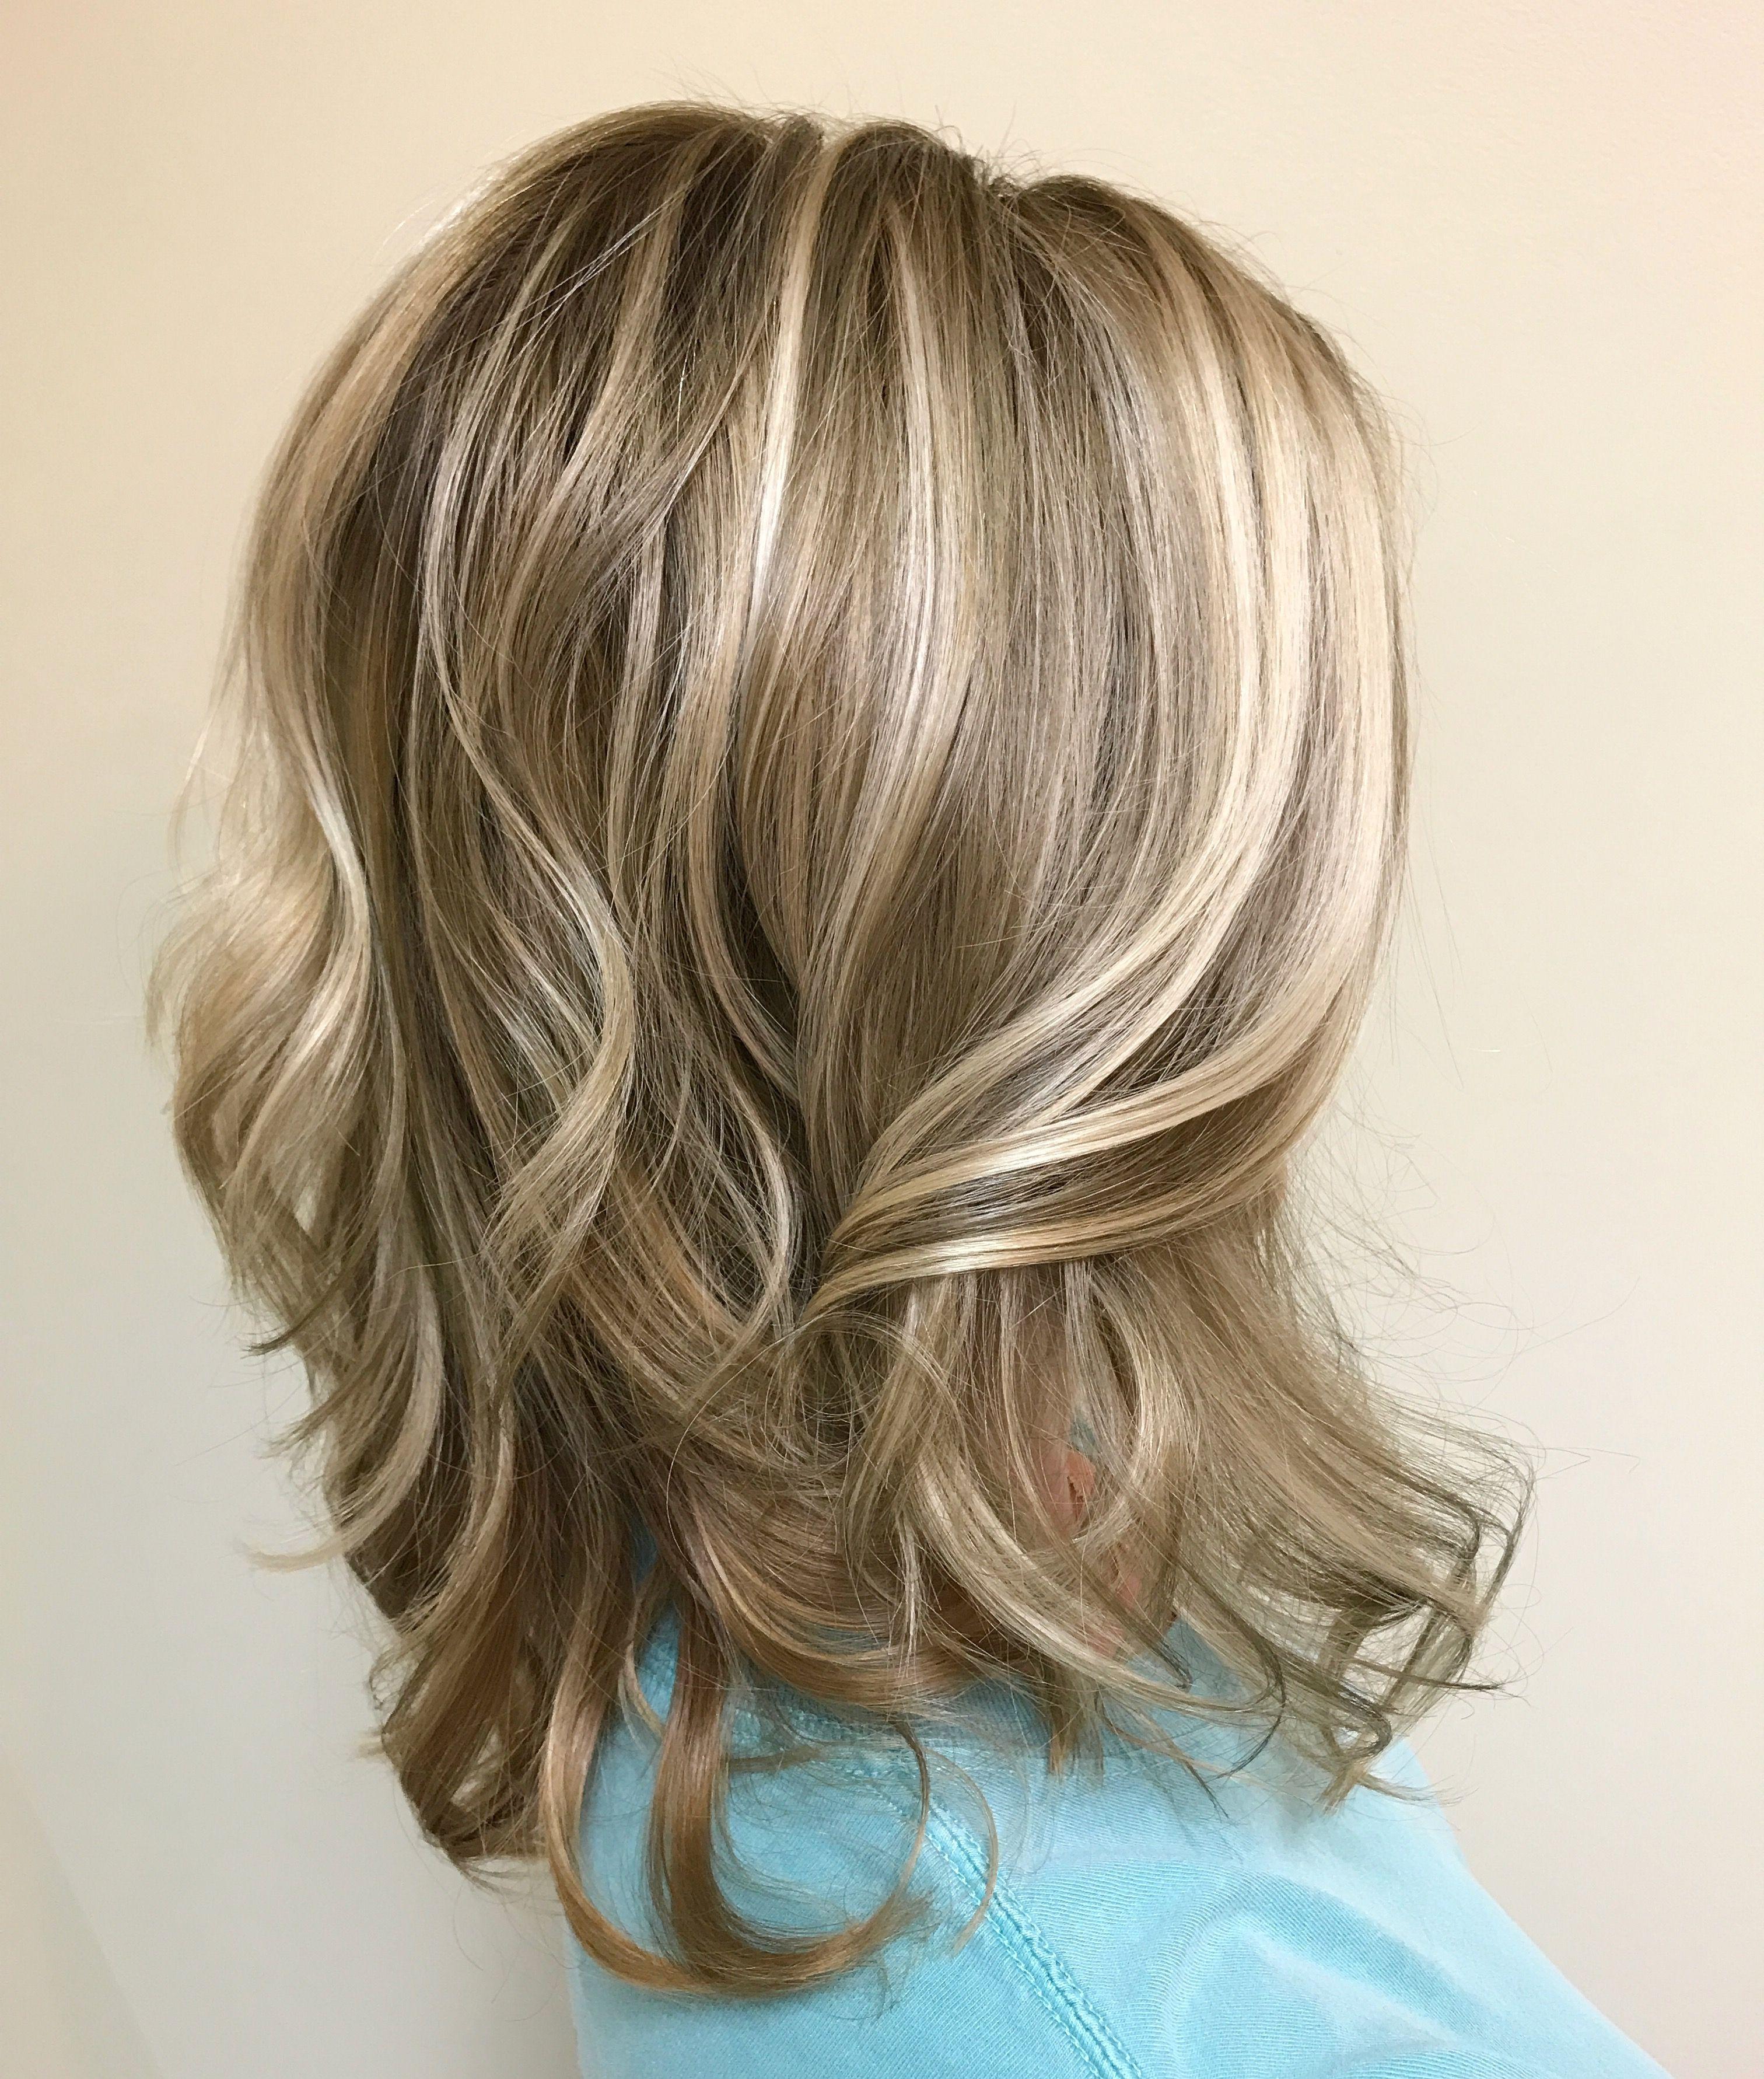 Dimensional blonde balayage for medium length hair   Hair styles, Blonde balayage, Medium length ...